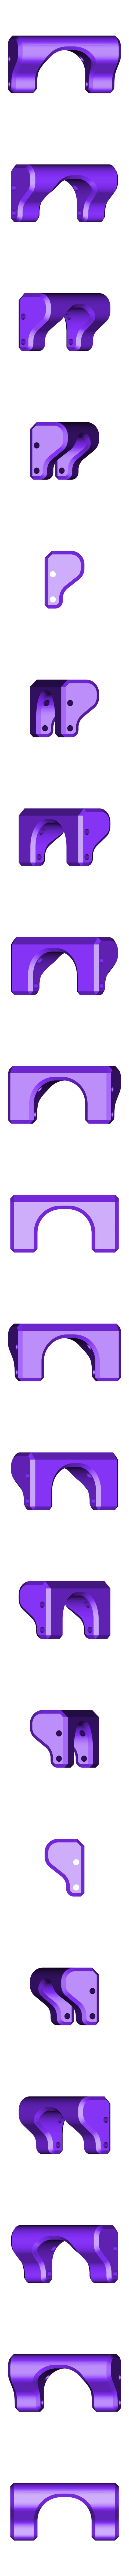 handle_grip.stl Download free STL file Beastgrip Remix MK3 • 3D printable template, Kajdalon